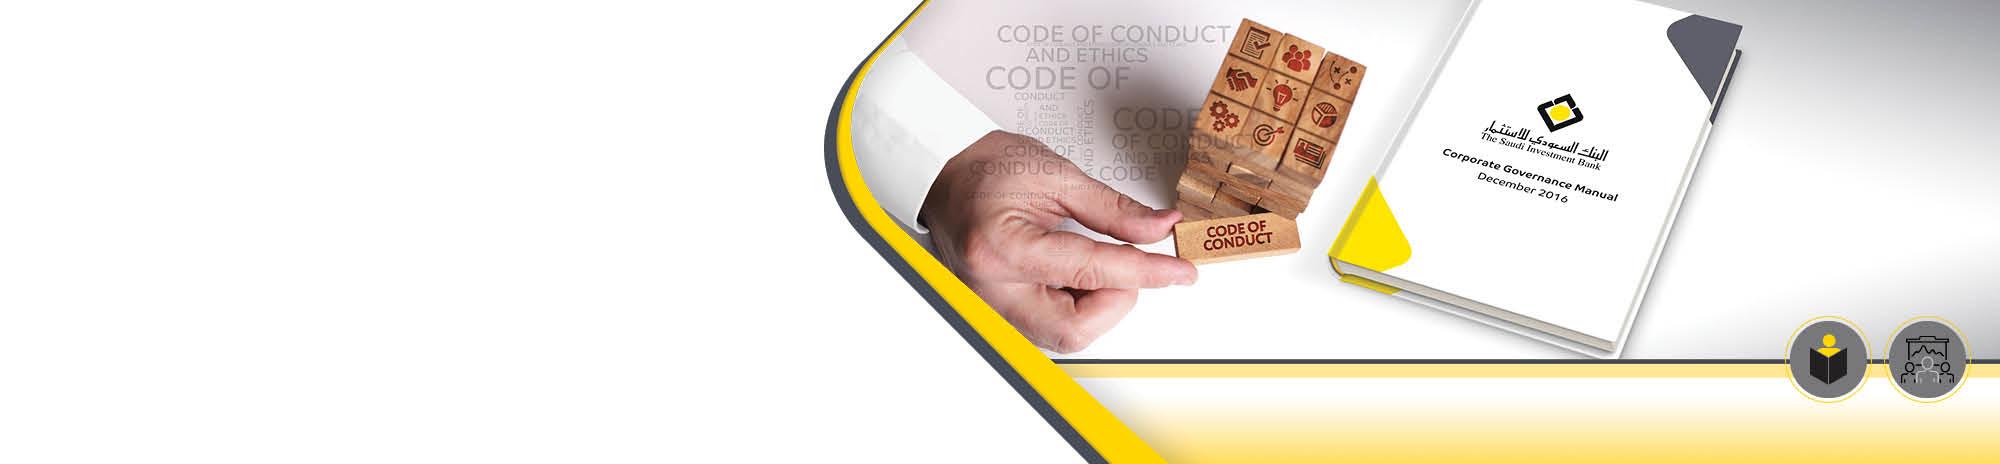 The saudi investment bank code shwetark investment rarities